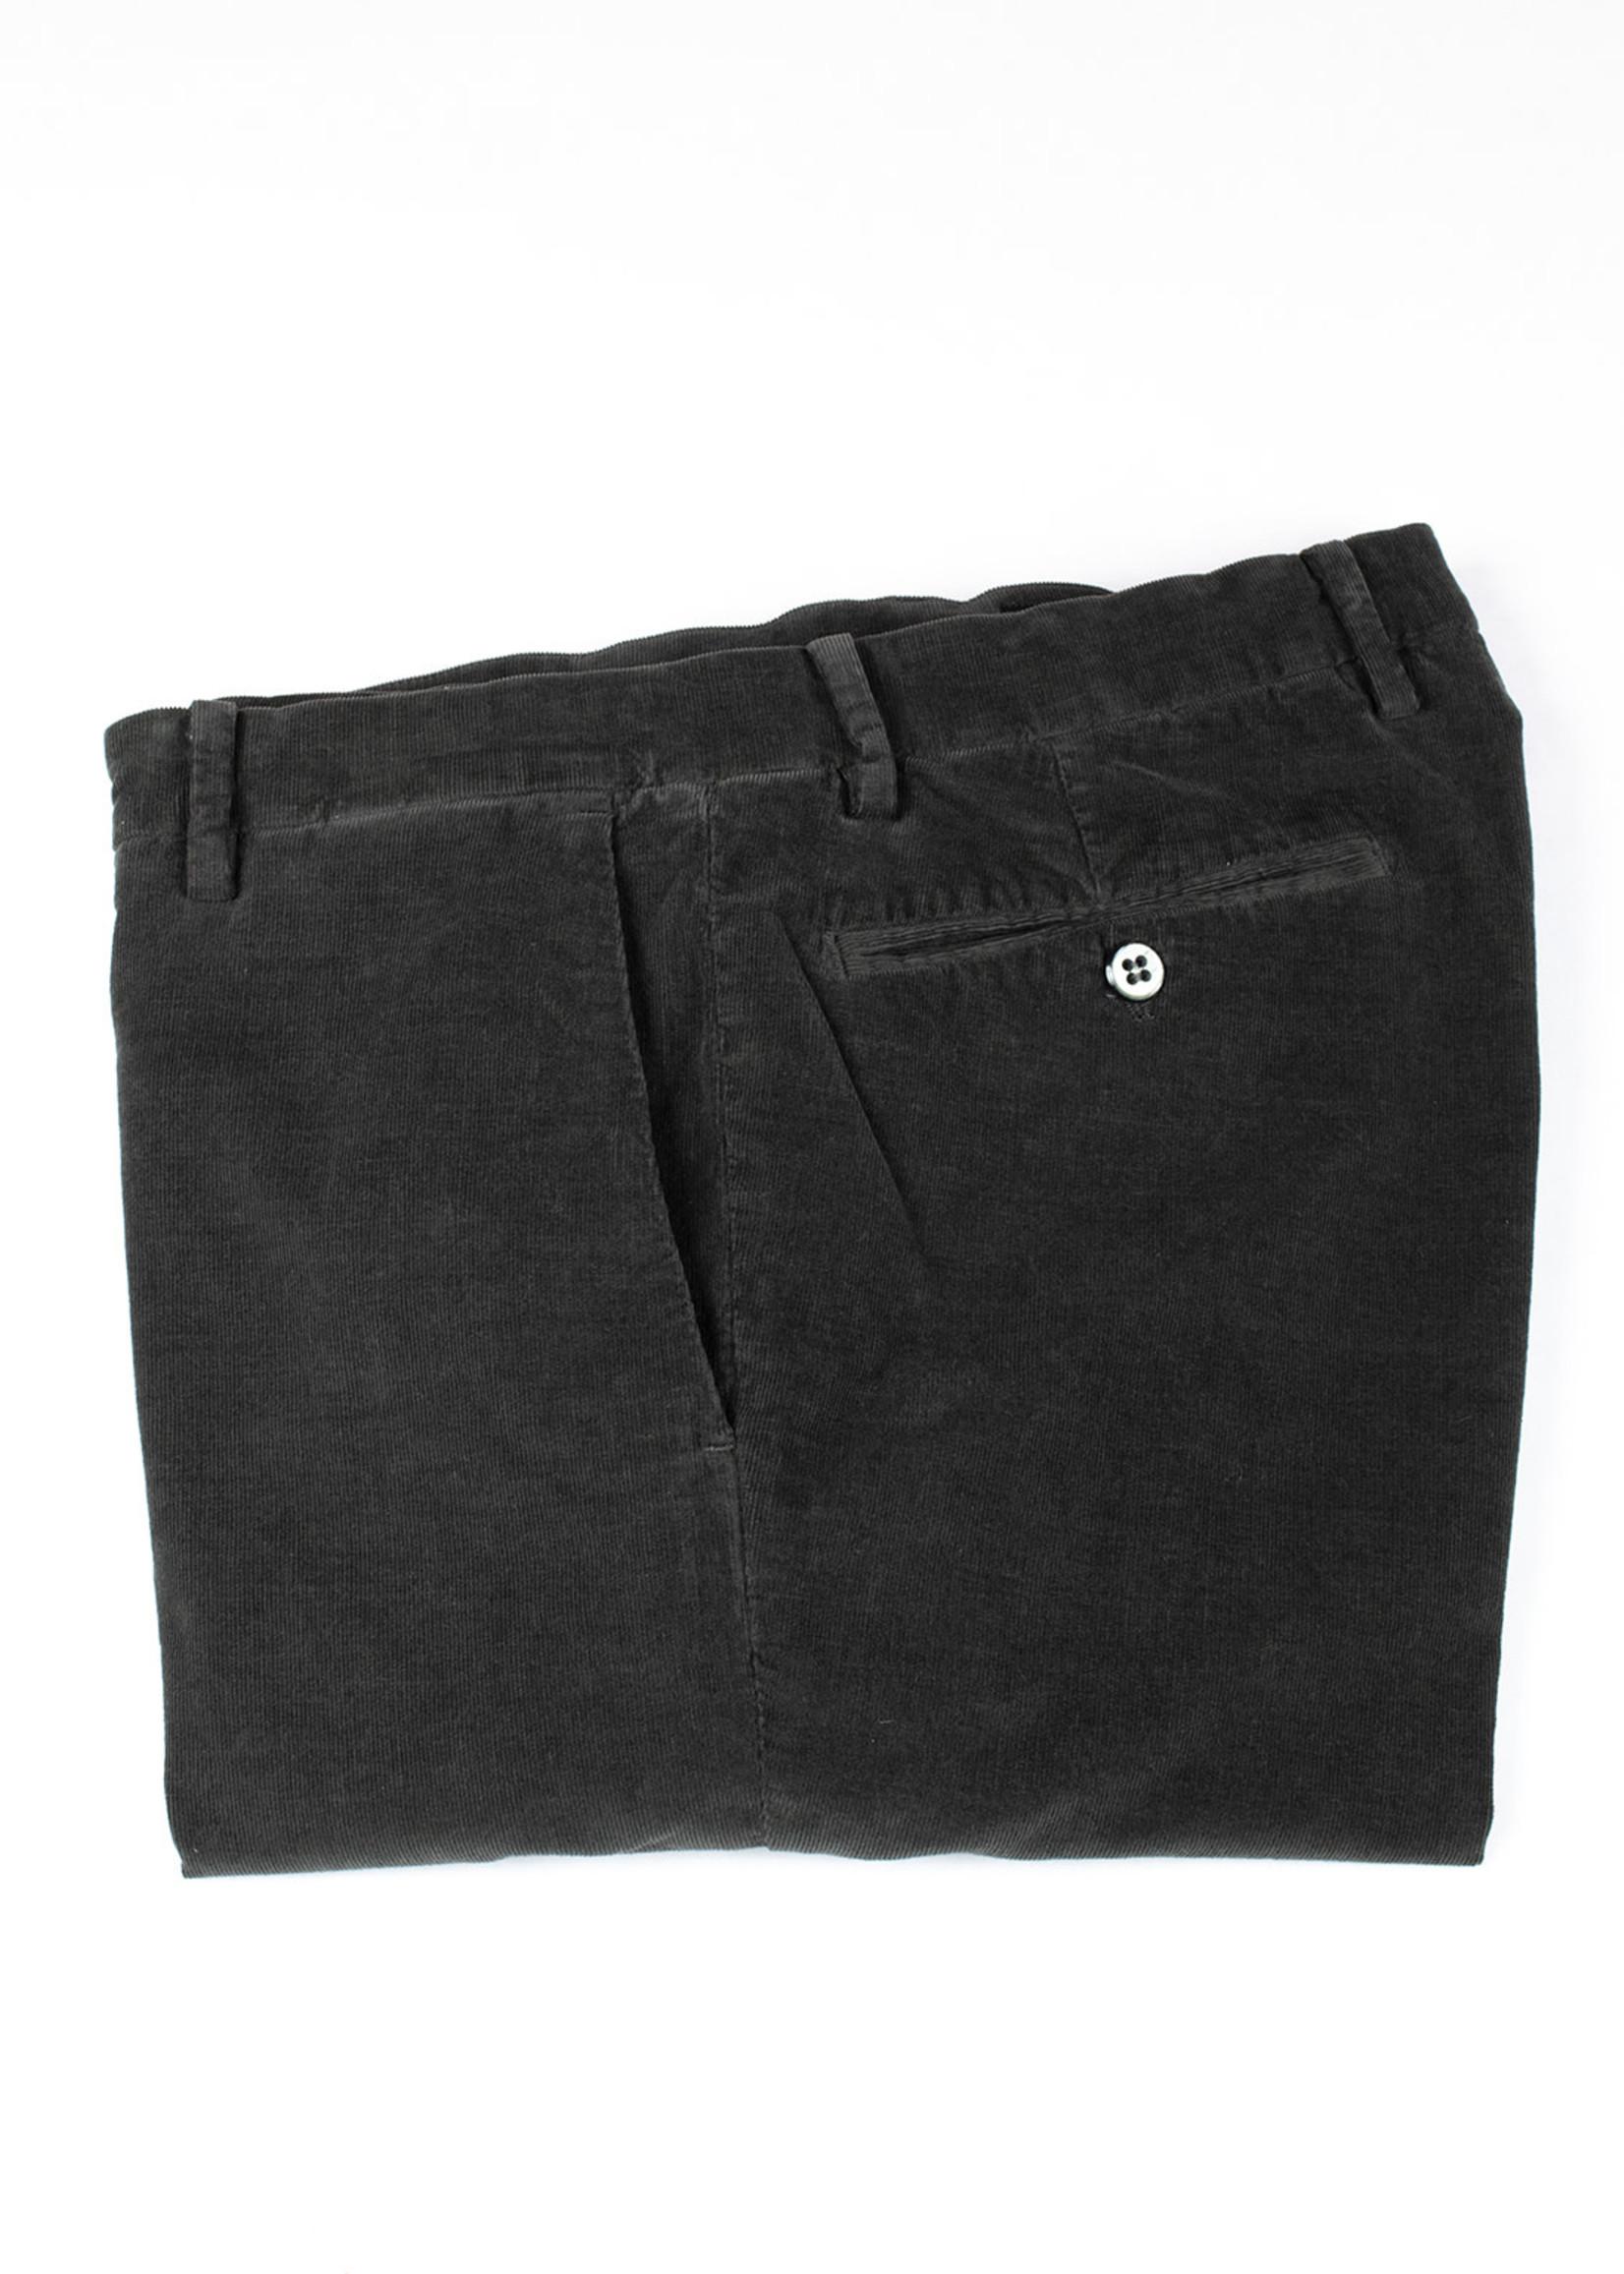 Mason's New York Charcoal Cotton Corduroy Trousers